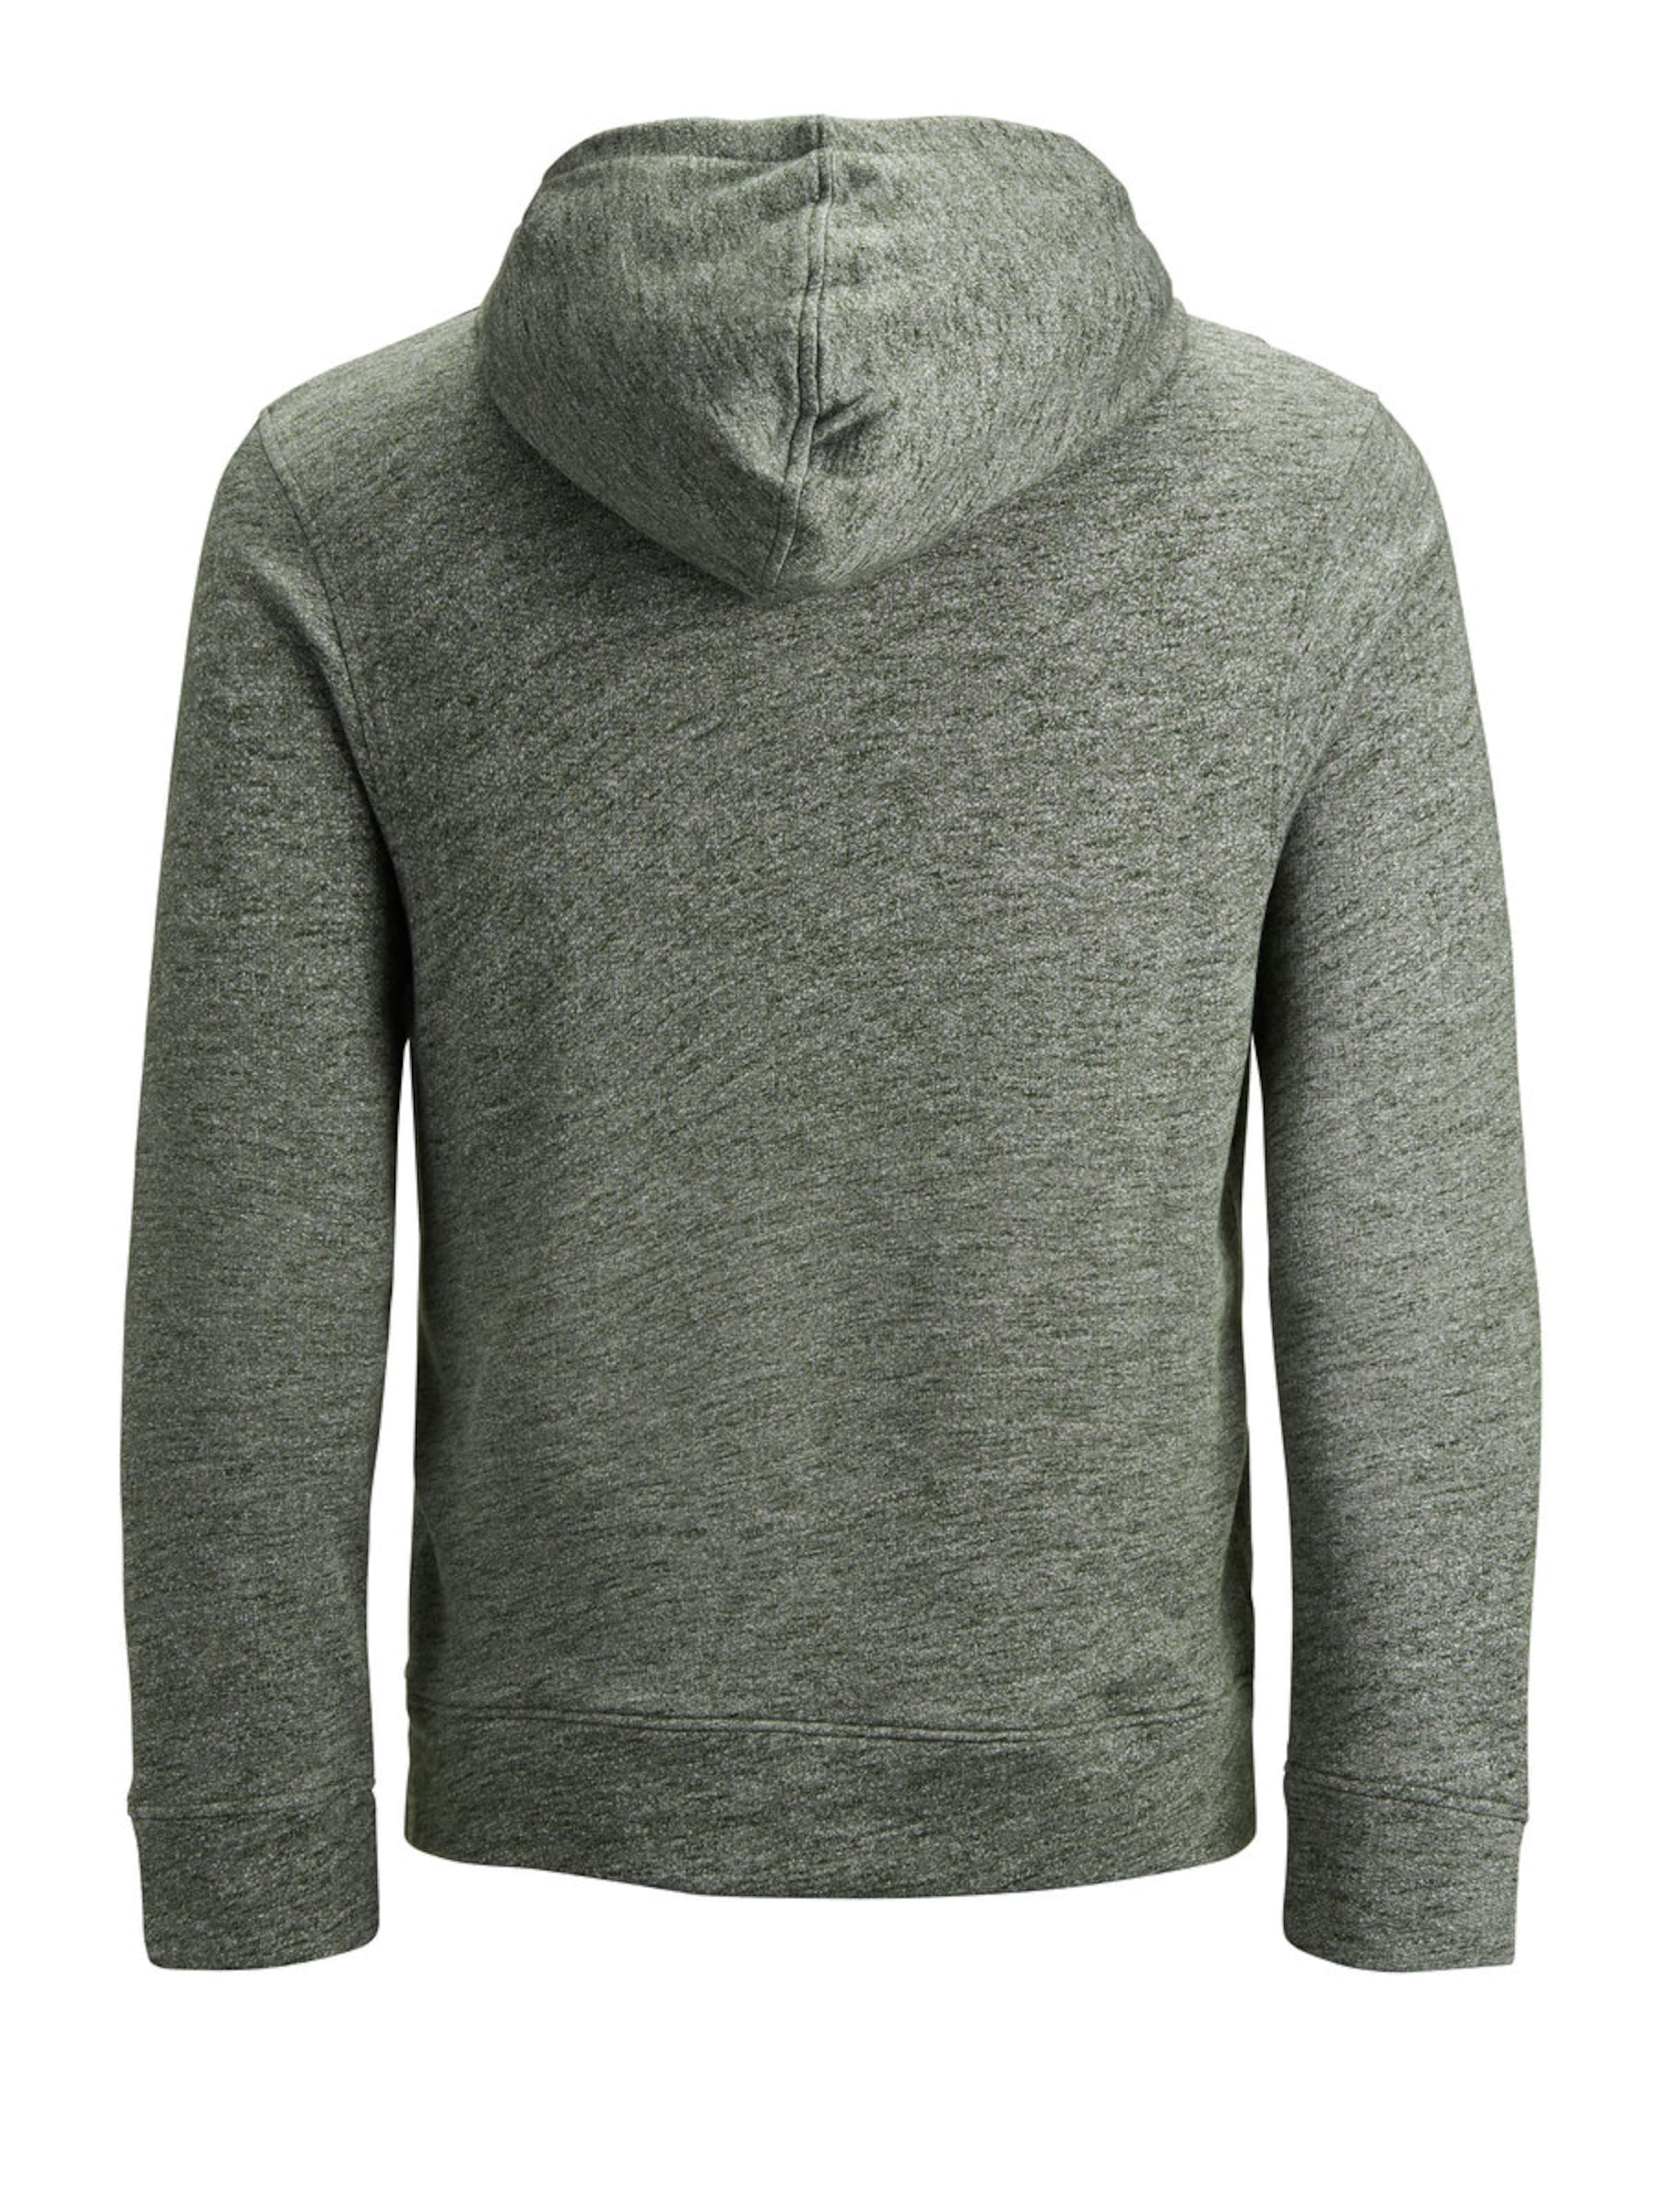 OliveNoir Jackamp; En Jones shirt Sweat 1TlKcFJ